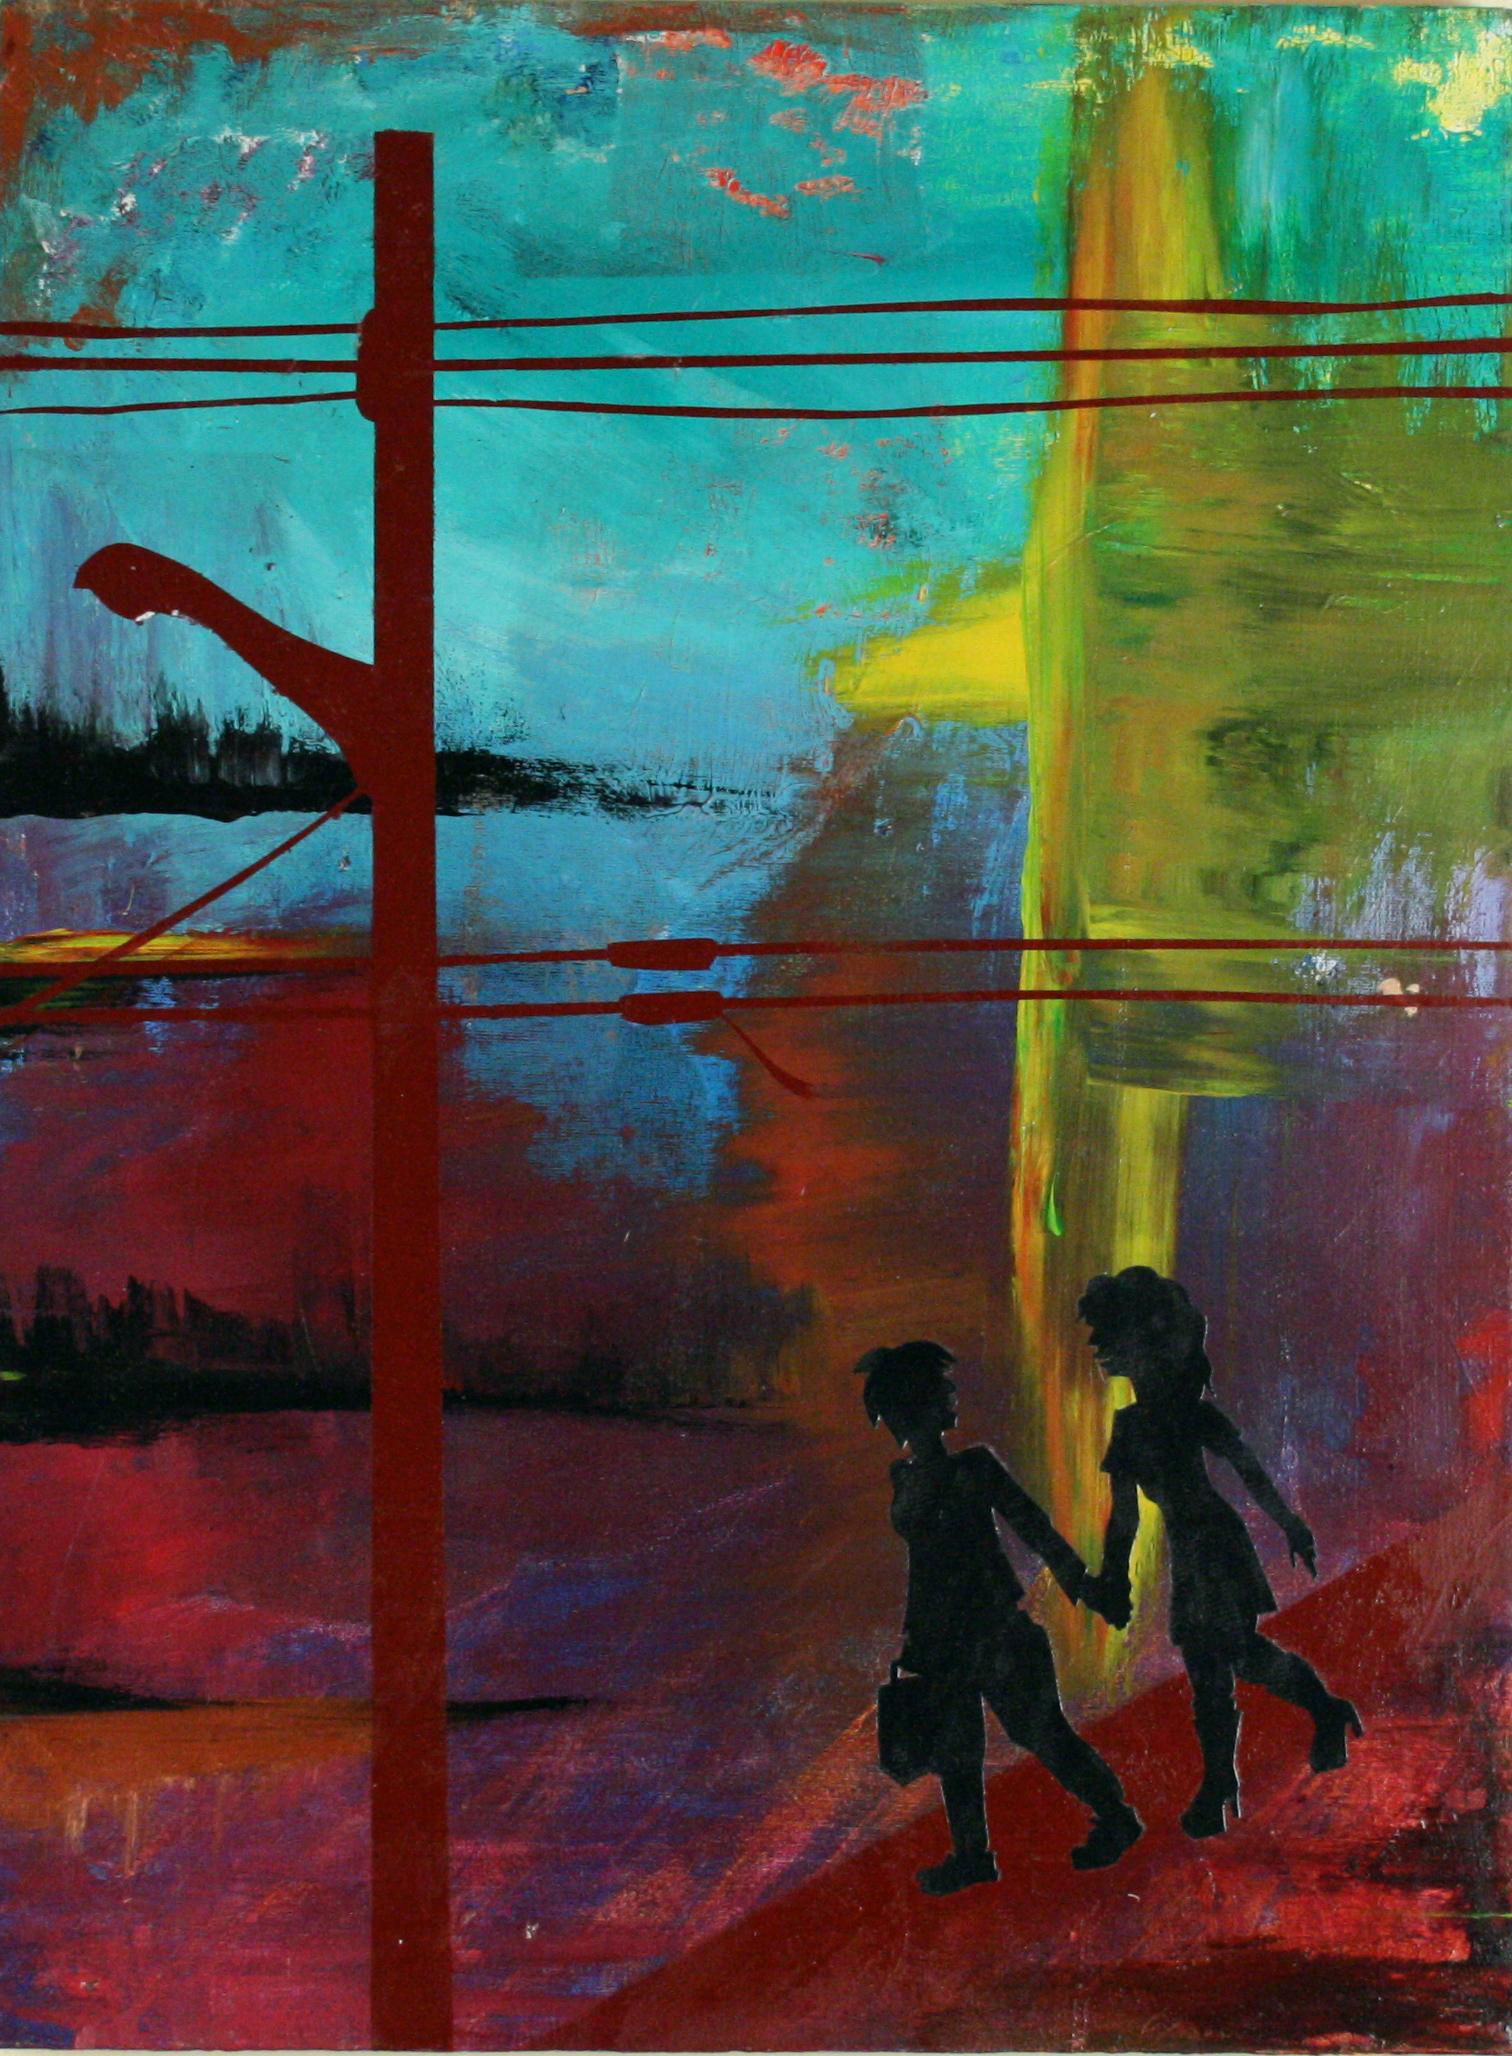 """Walking Home."" Katrina Knutson. 2012.Acrylic, aerosol and paper on canvas"